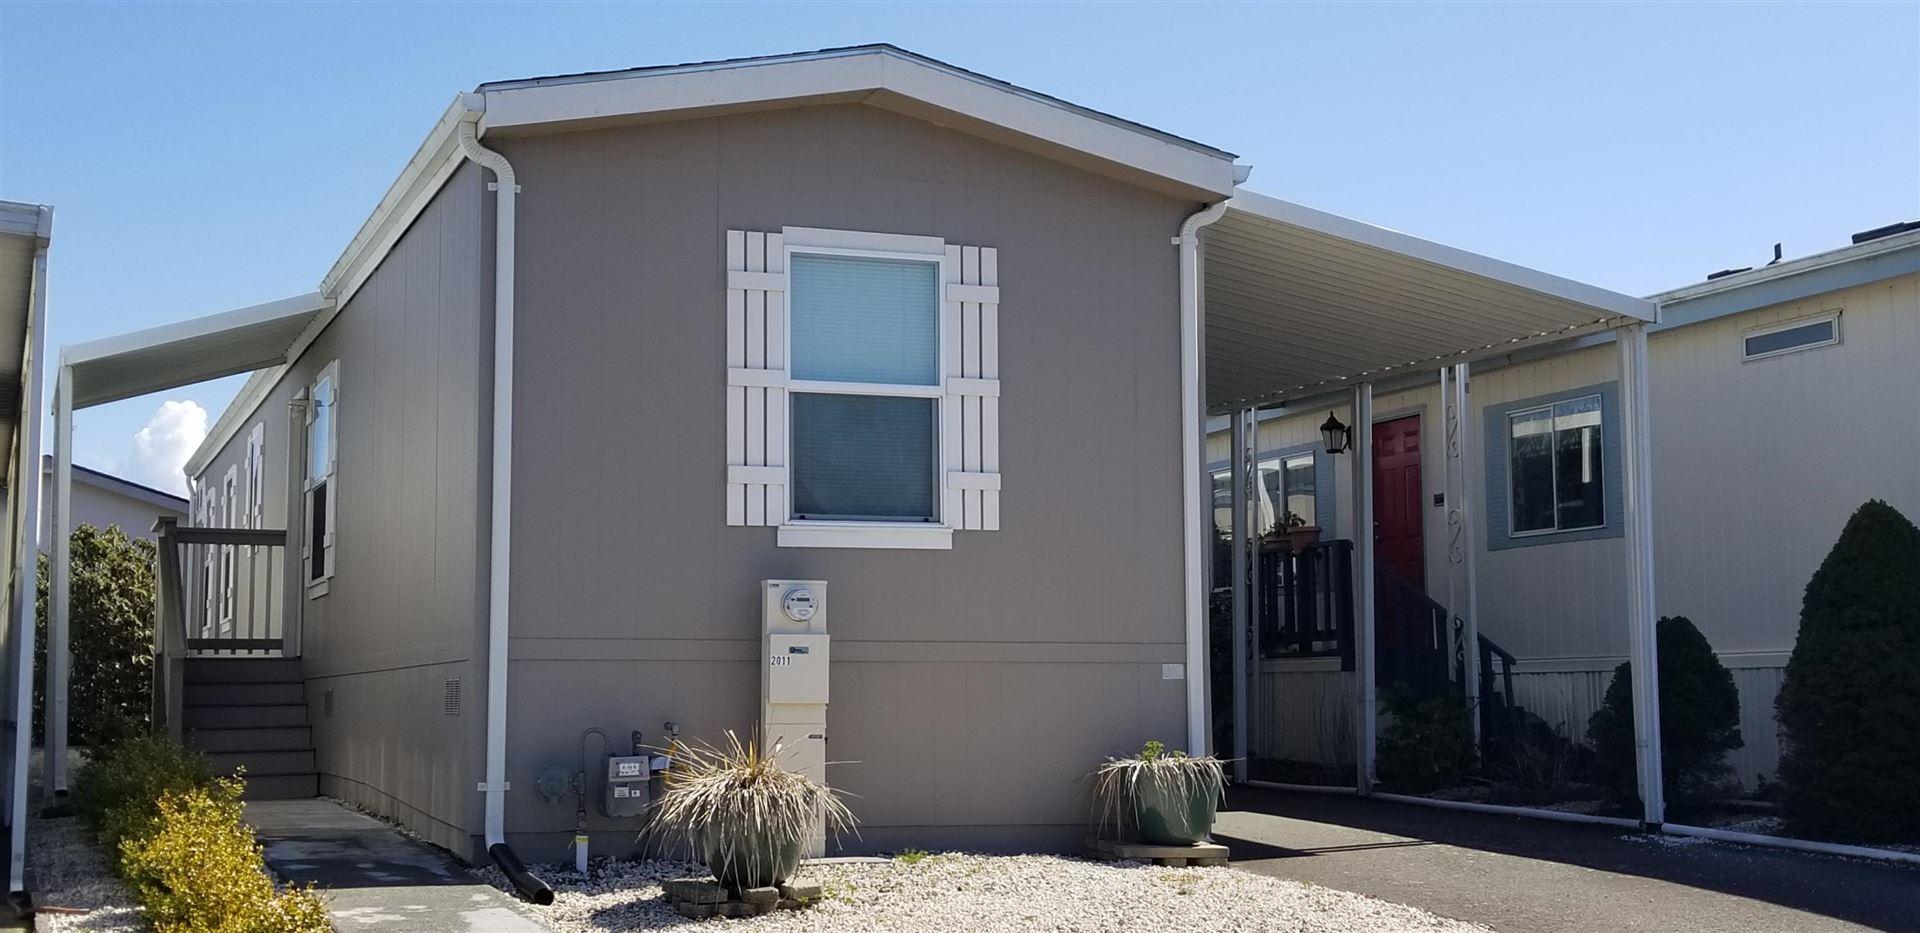 2011 Hummingbird Drive, McKinleyville, CA 95519 - #: 256245